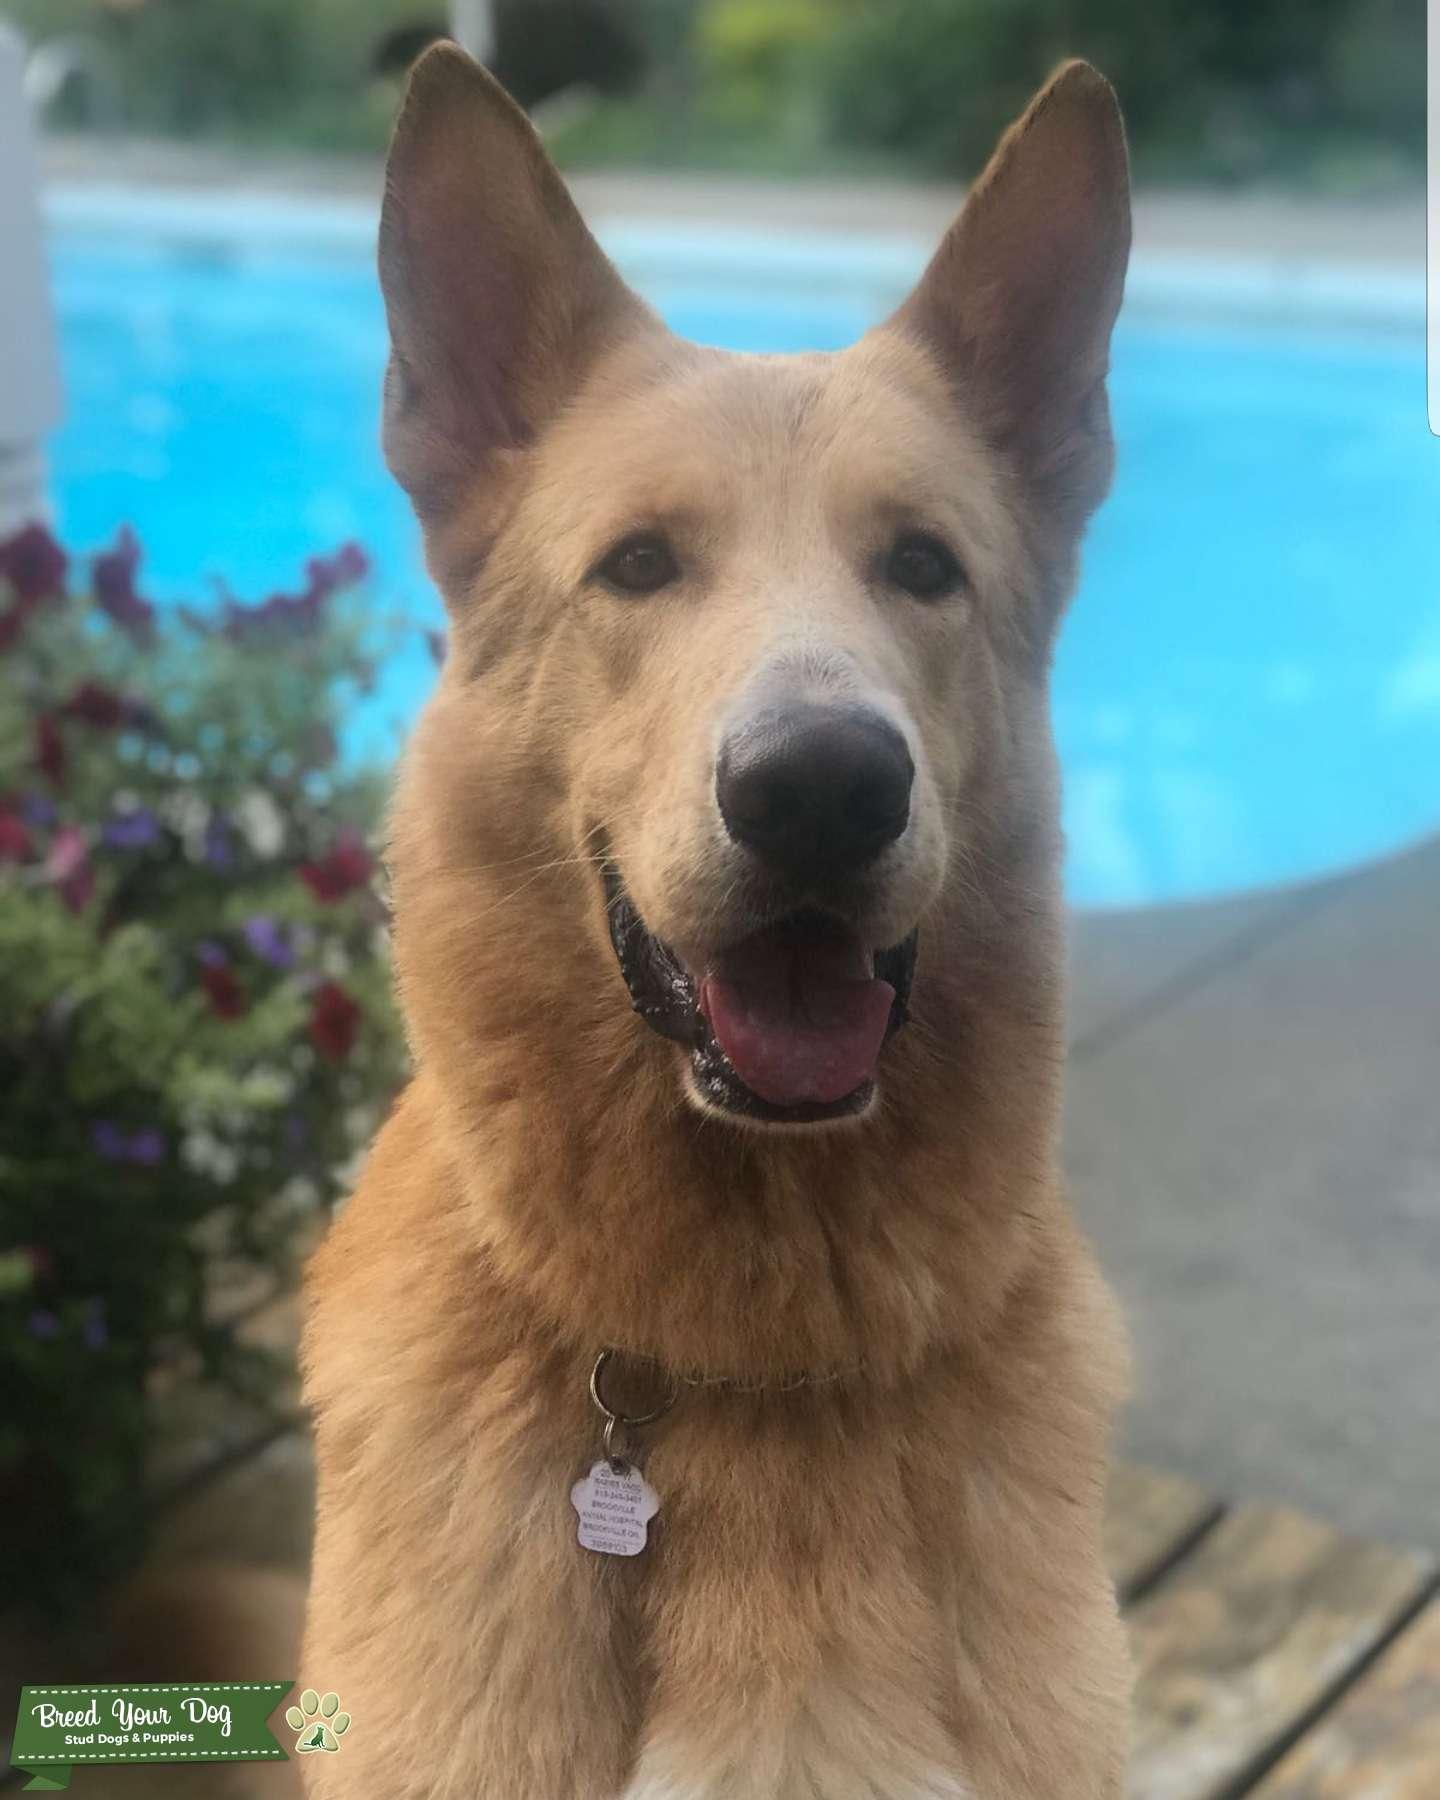 Stud Dog Blonde German Shepherd Purebred Breed Your Dog